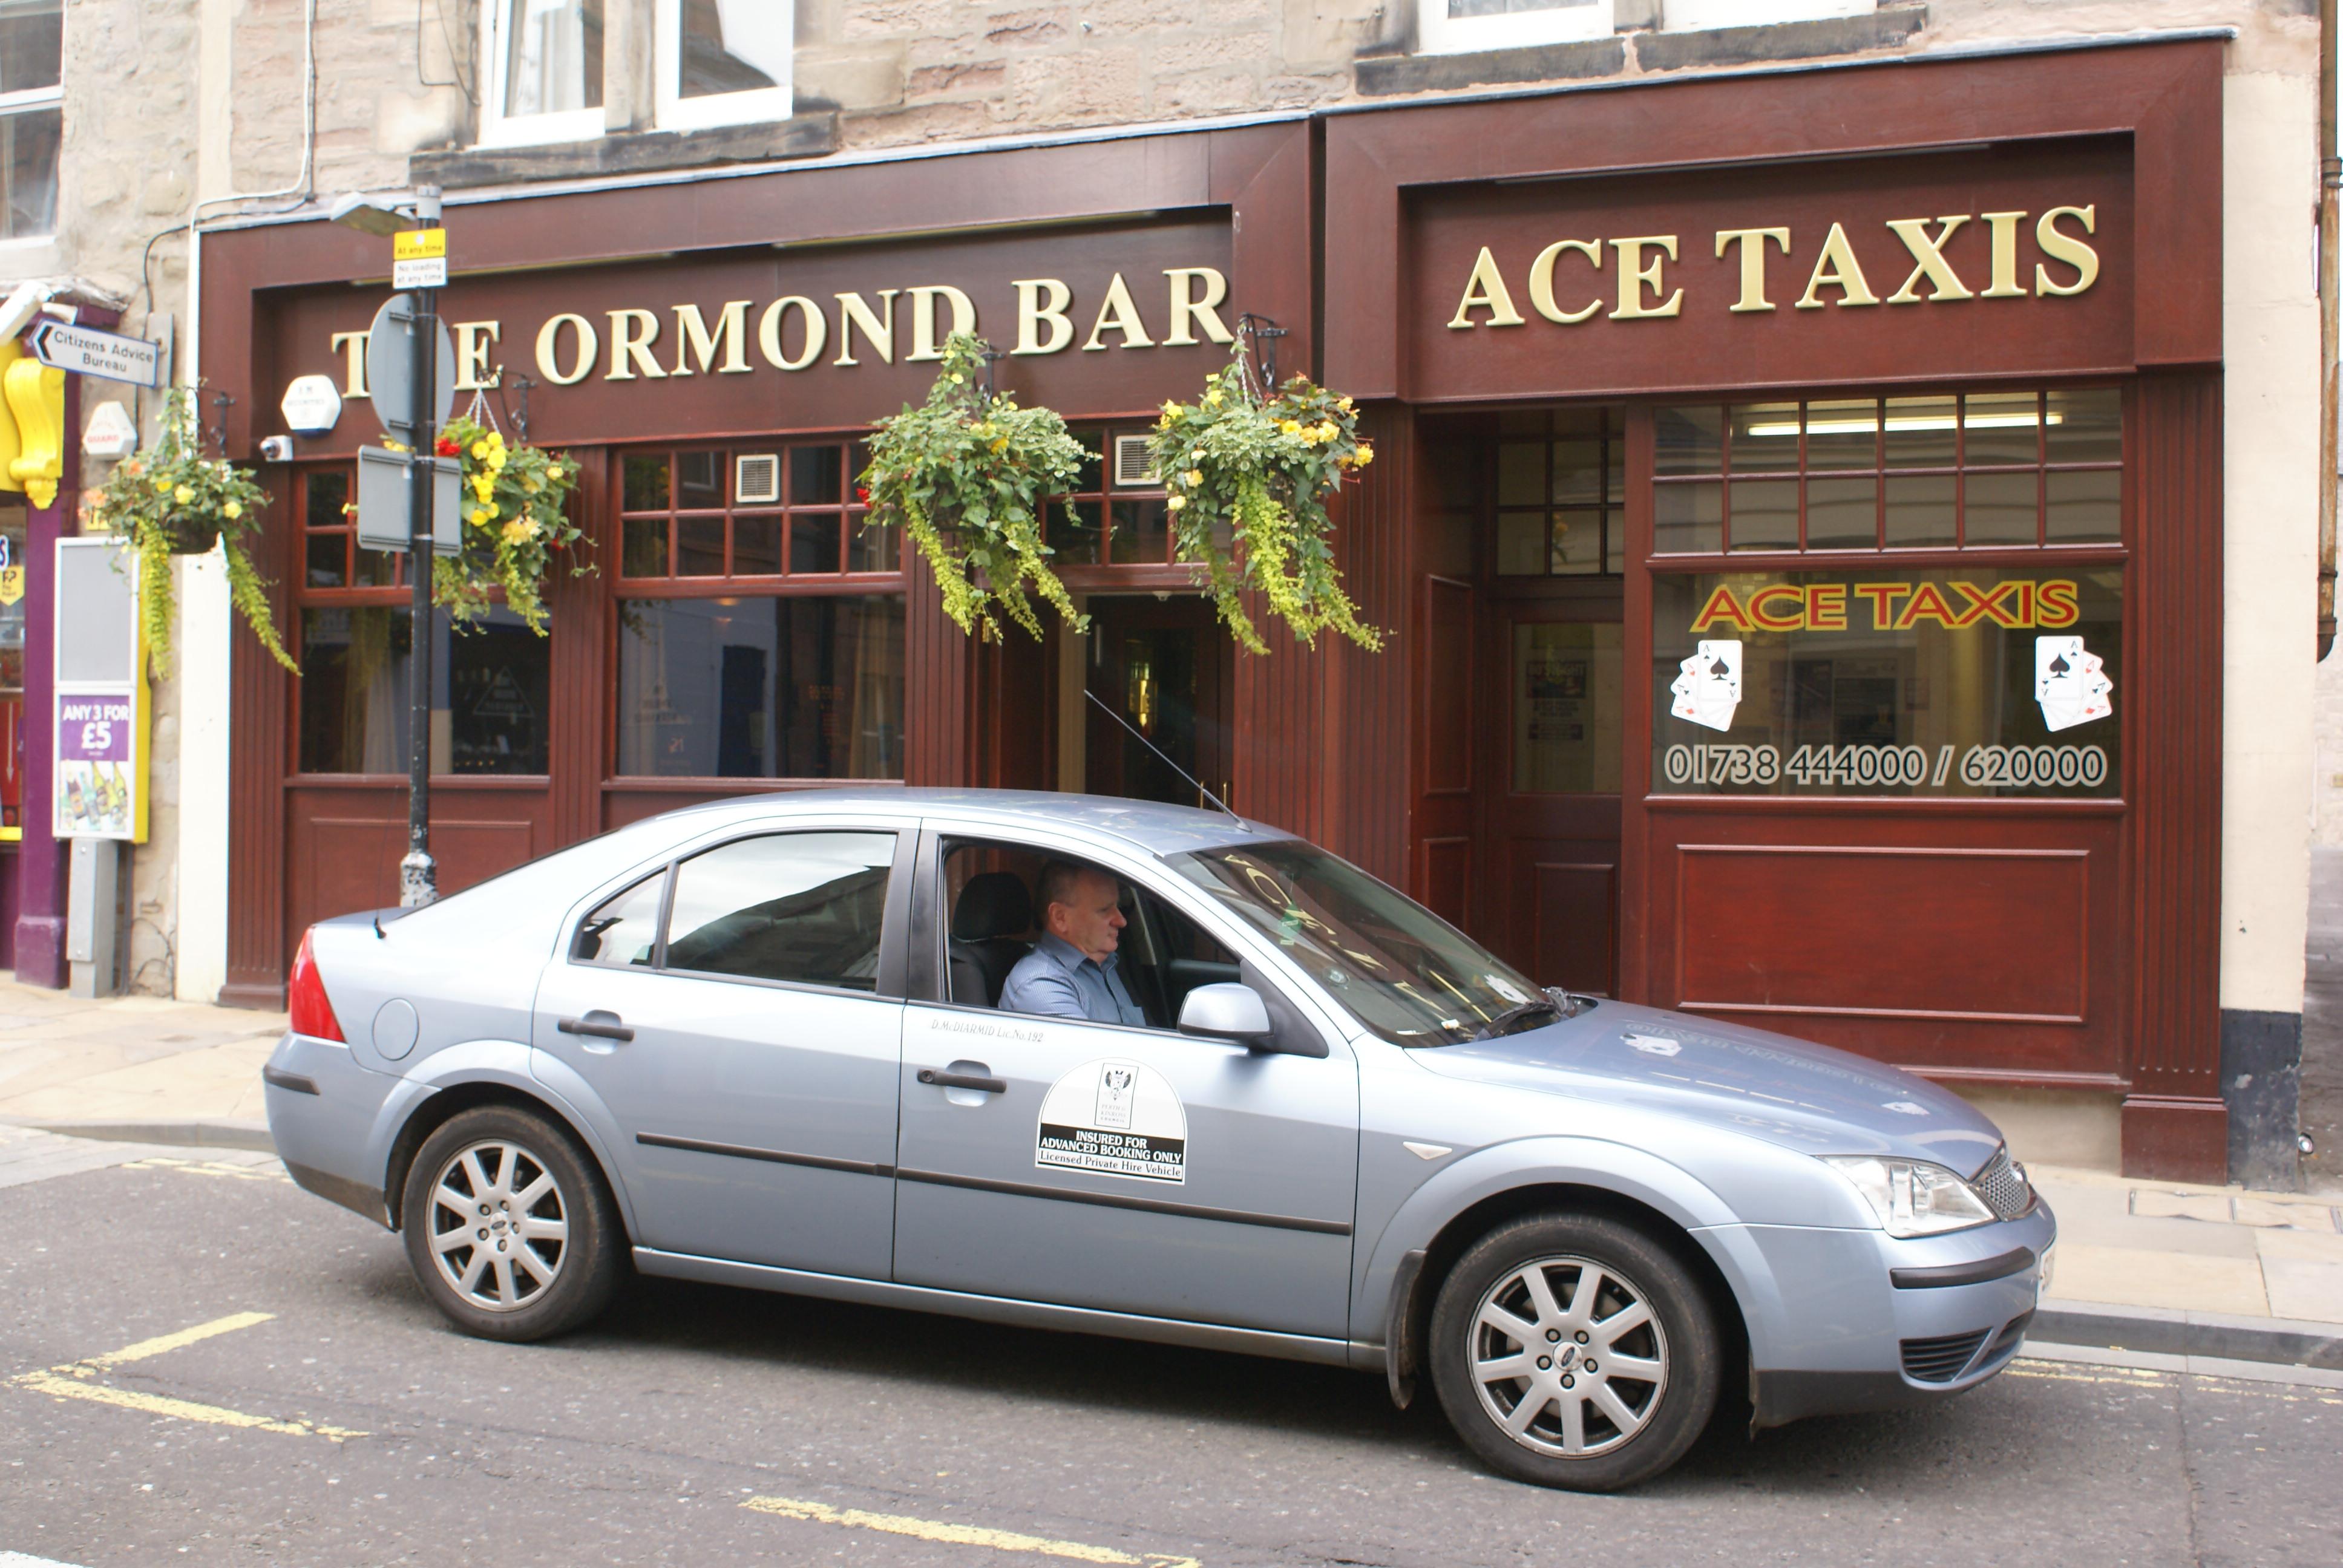 Ace Cars Taxi Roman Road